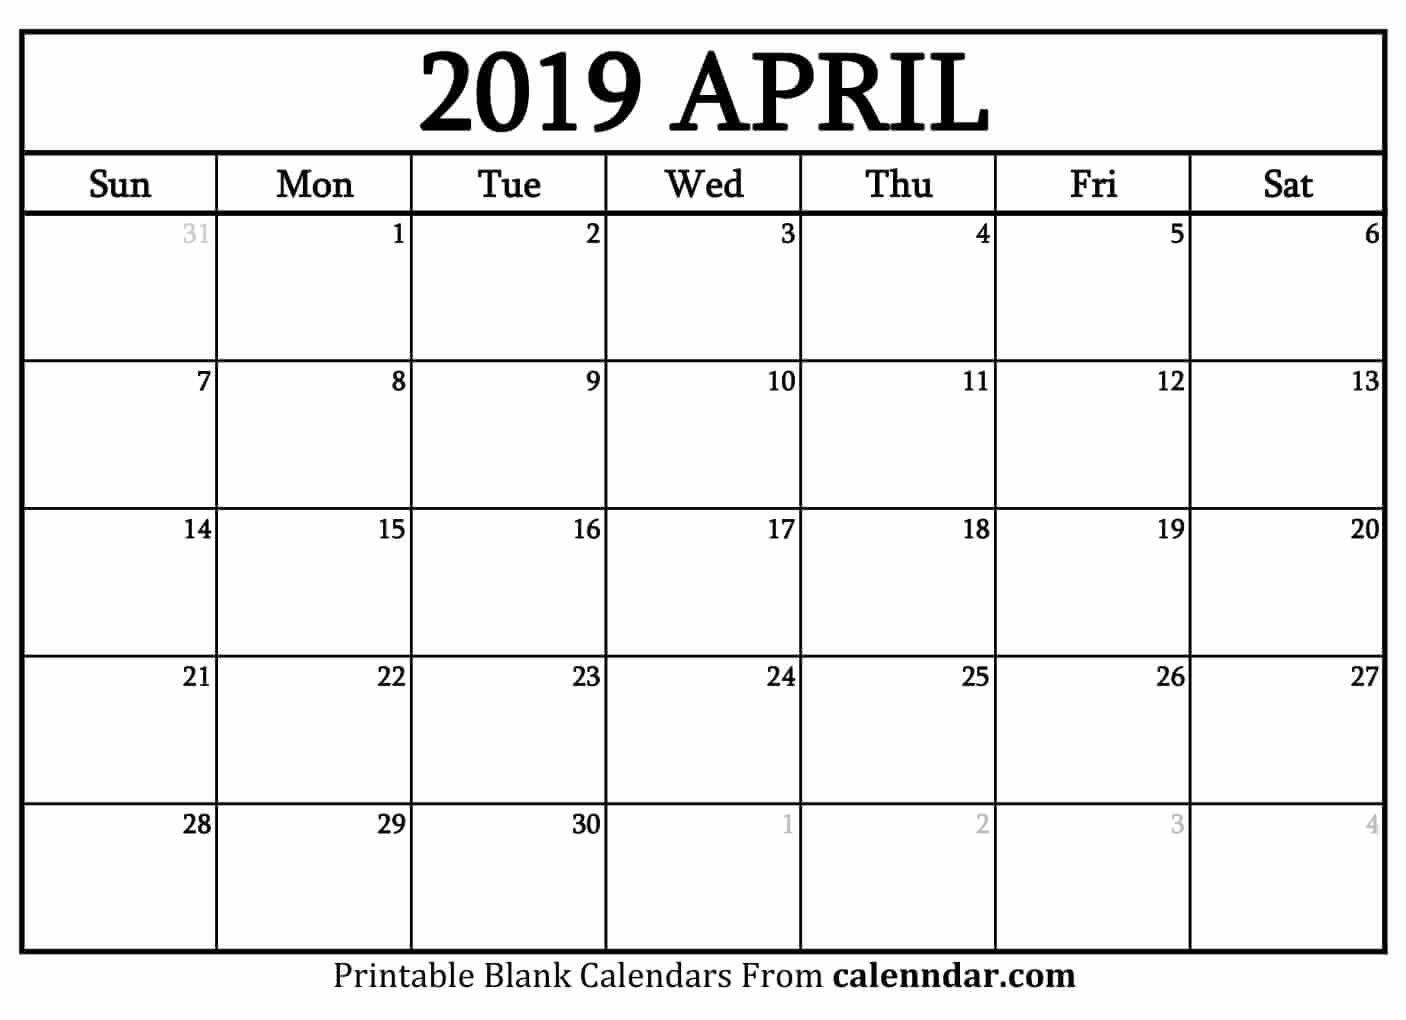 Blank April 2019 Printable Calendar – Printable Calendar 2019| Blank Calendar 2019 April Printable